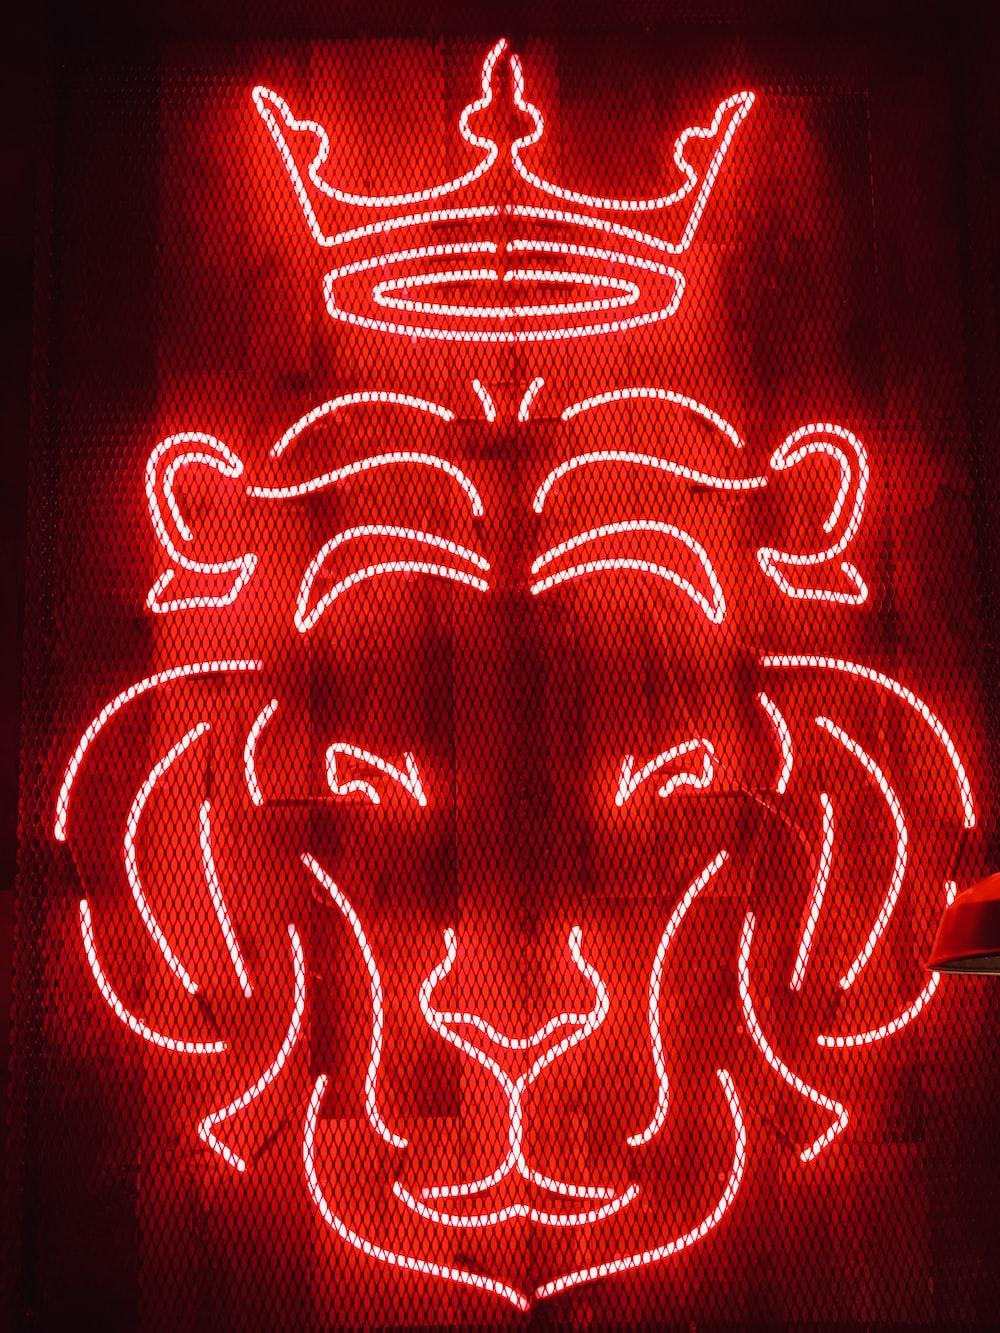 lion neon sigange